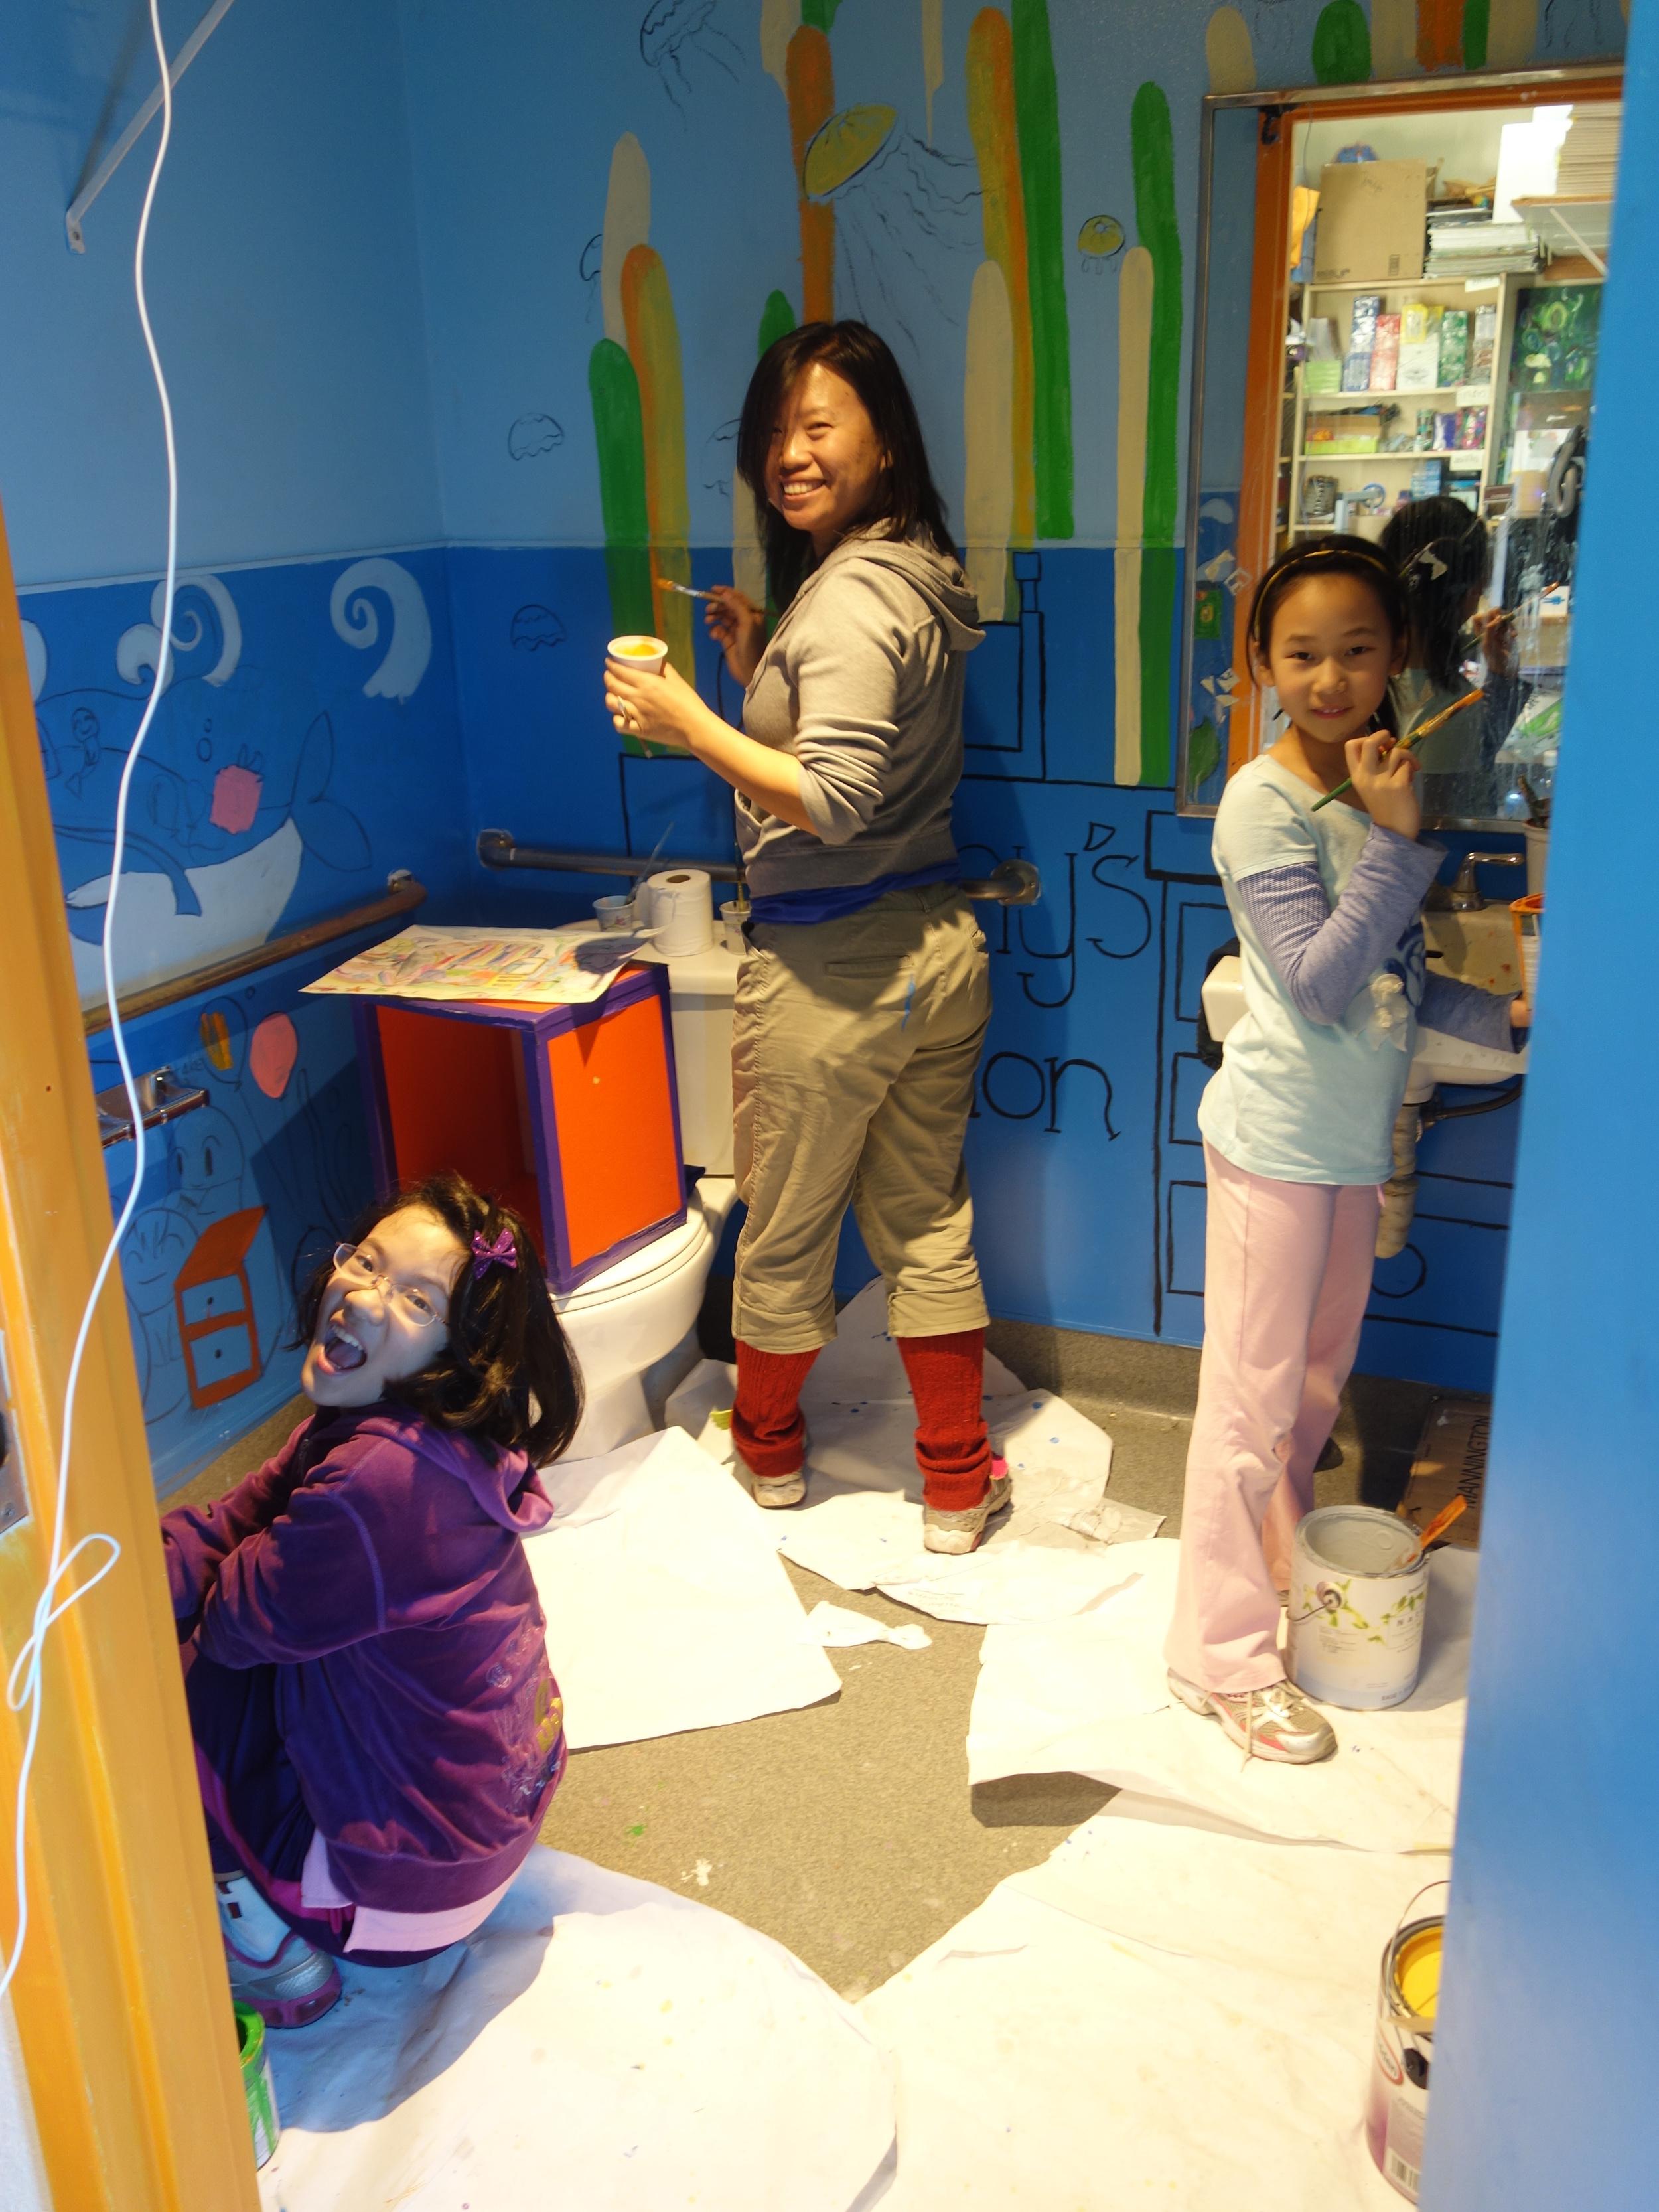 Landy, Kaelynn, and Hongyun repainting the bathroom at Hongyun Art